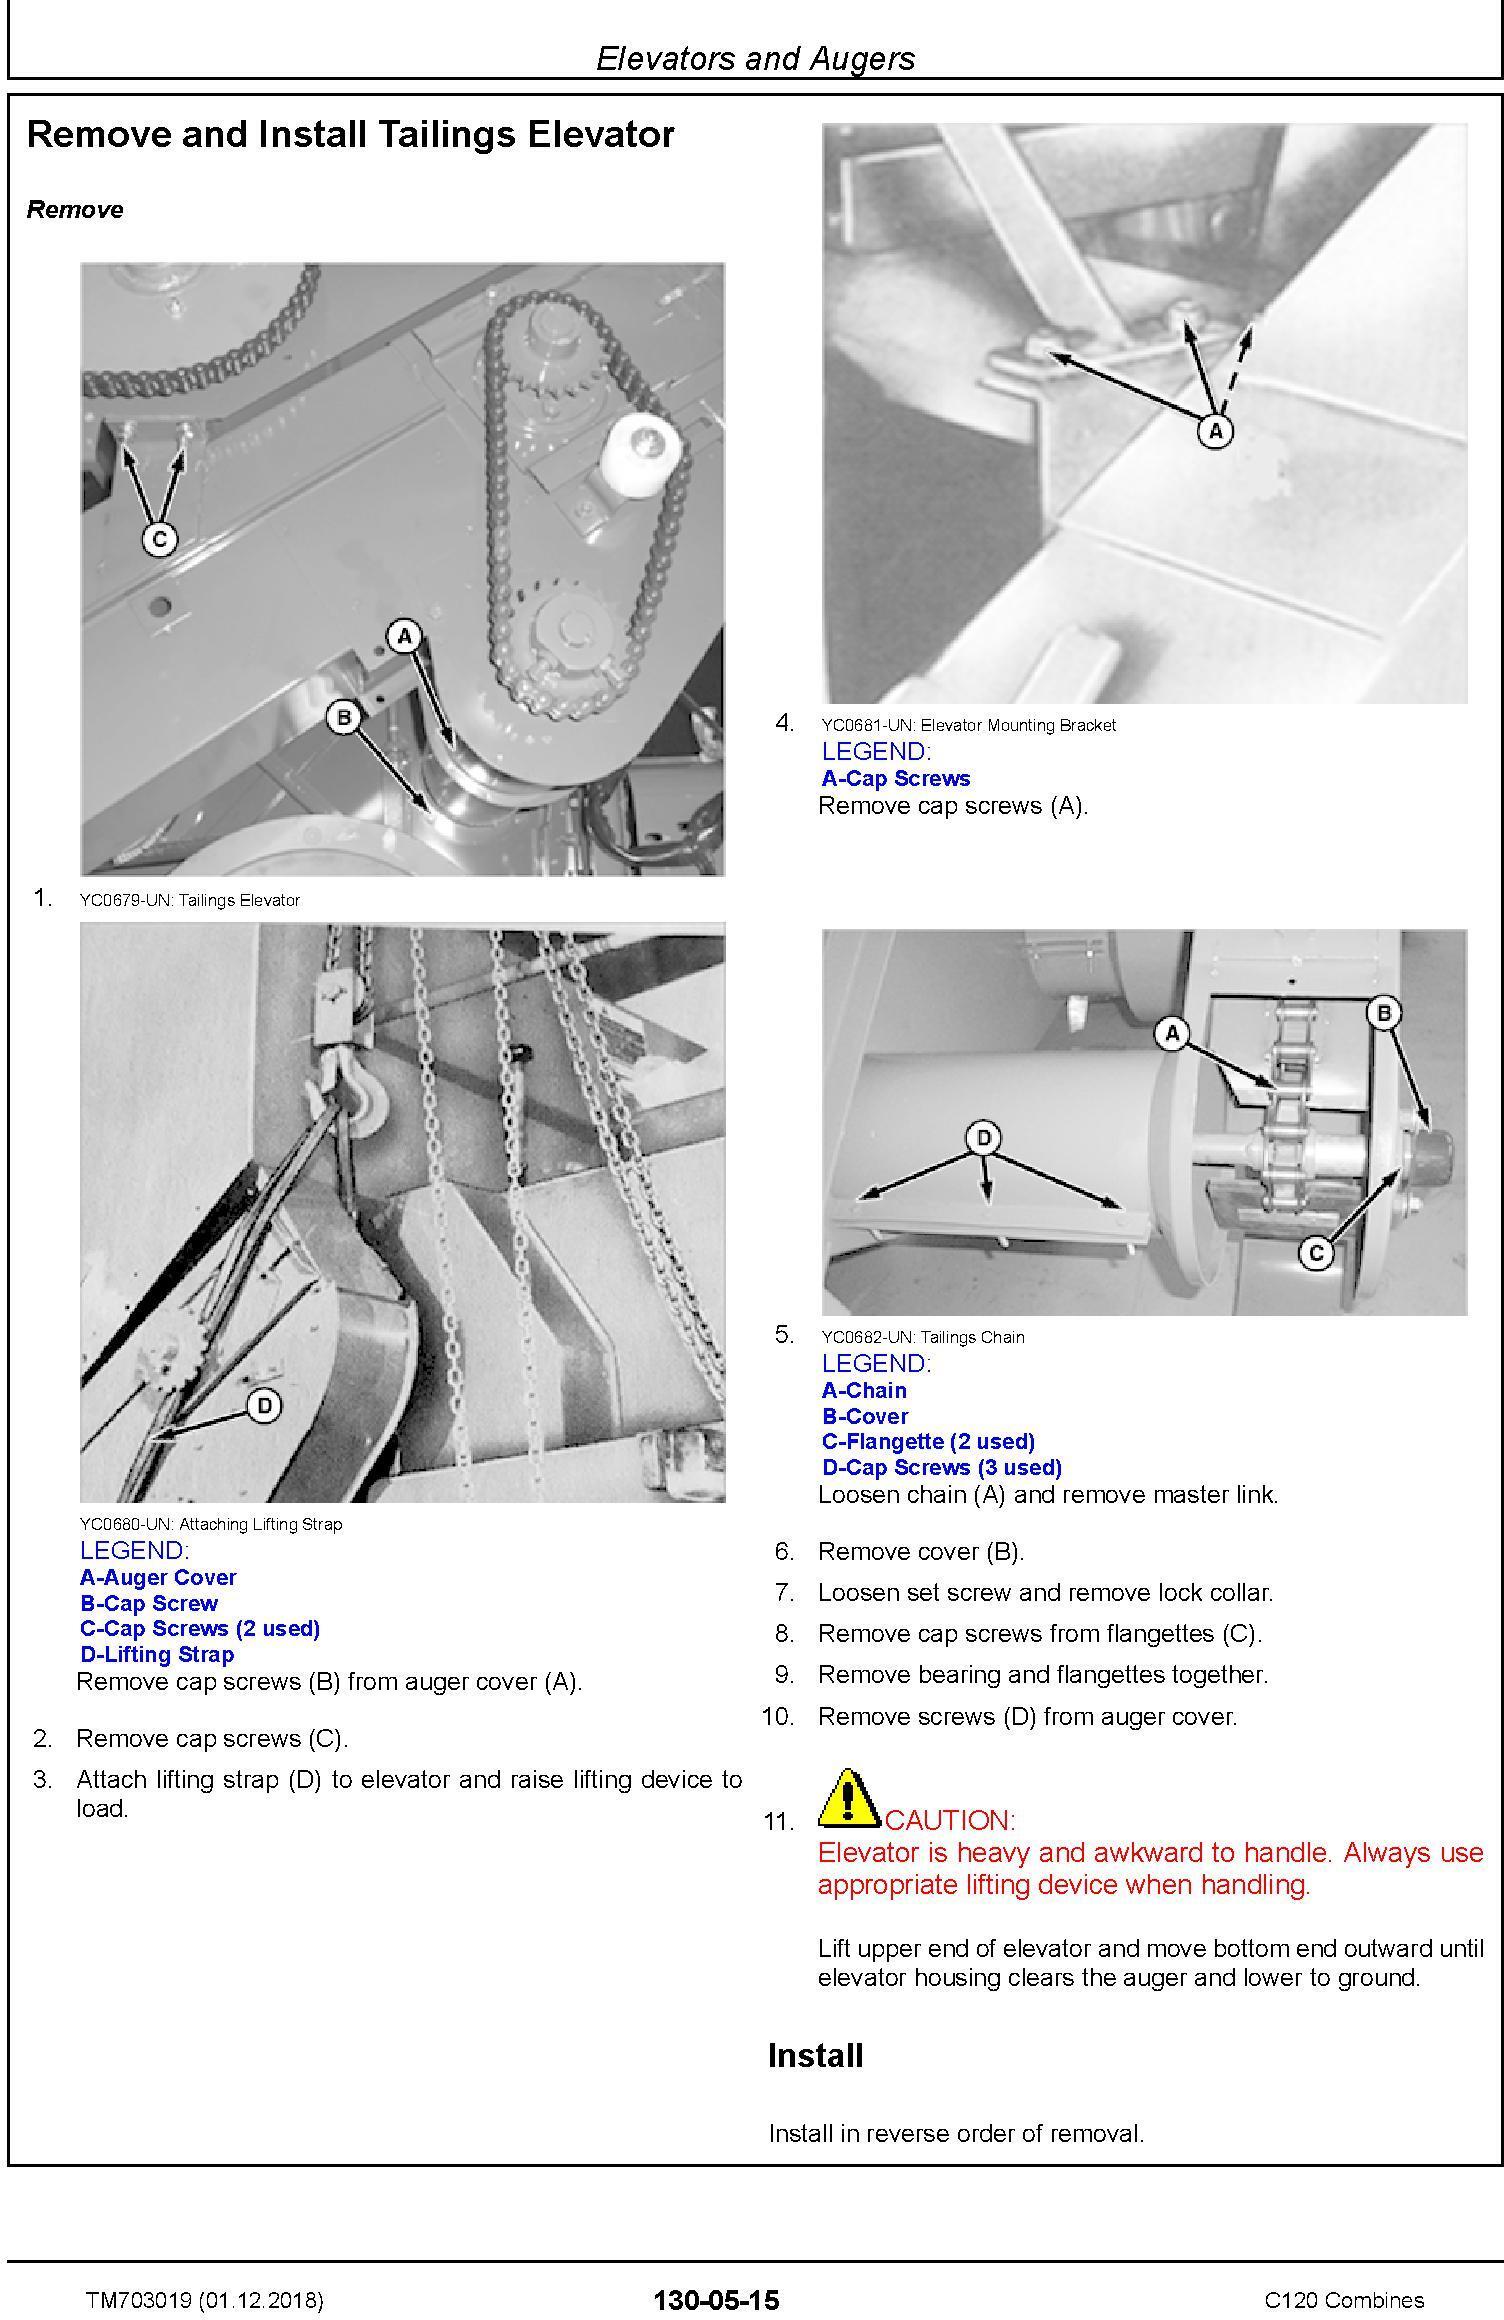 John Deere C120 Combines (Asian Edition) Technical Service Manual (TM703019) - 1